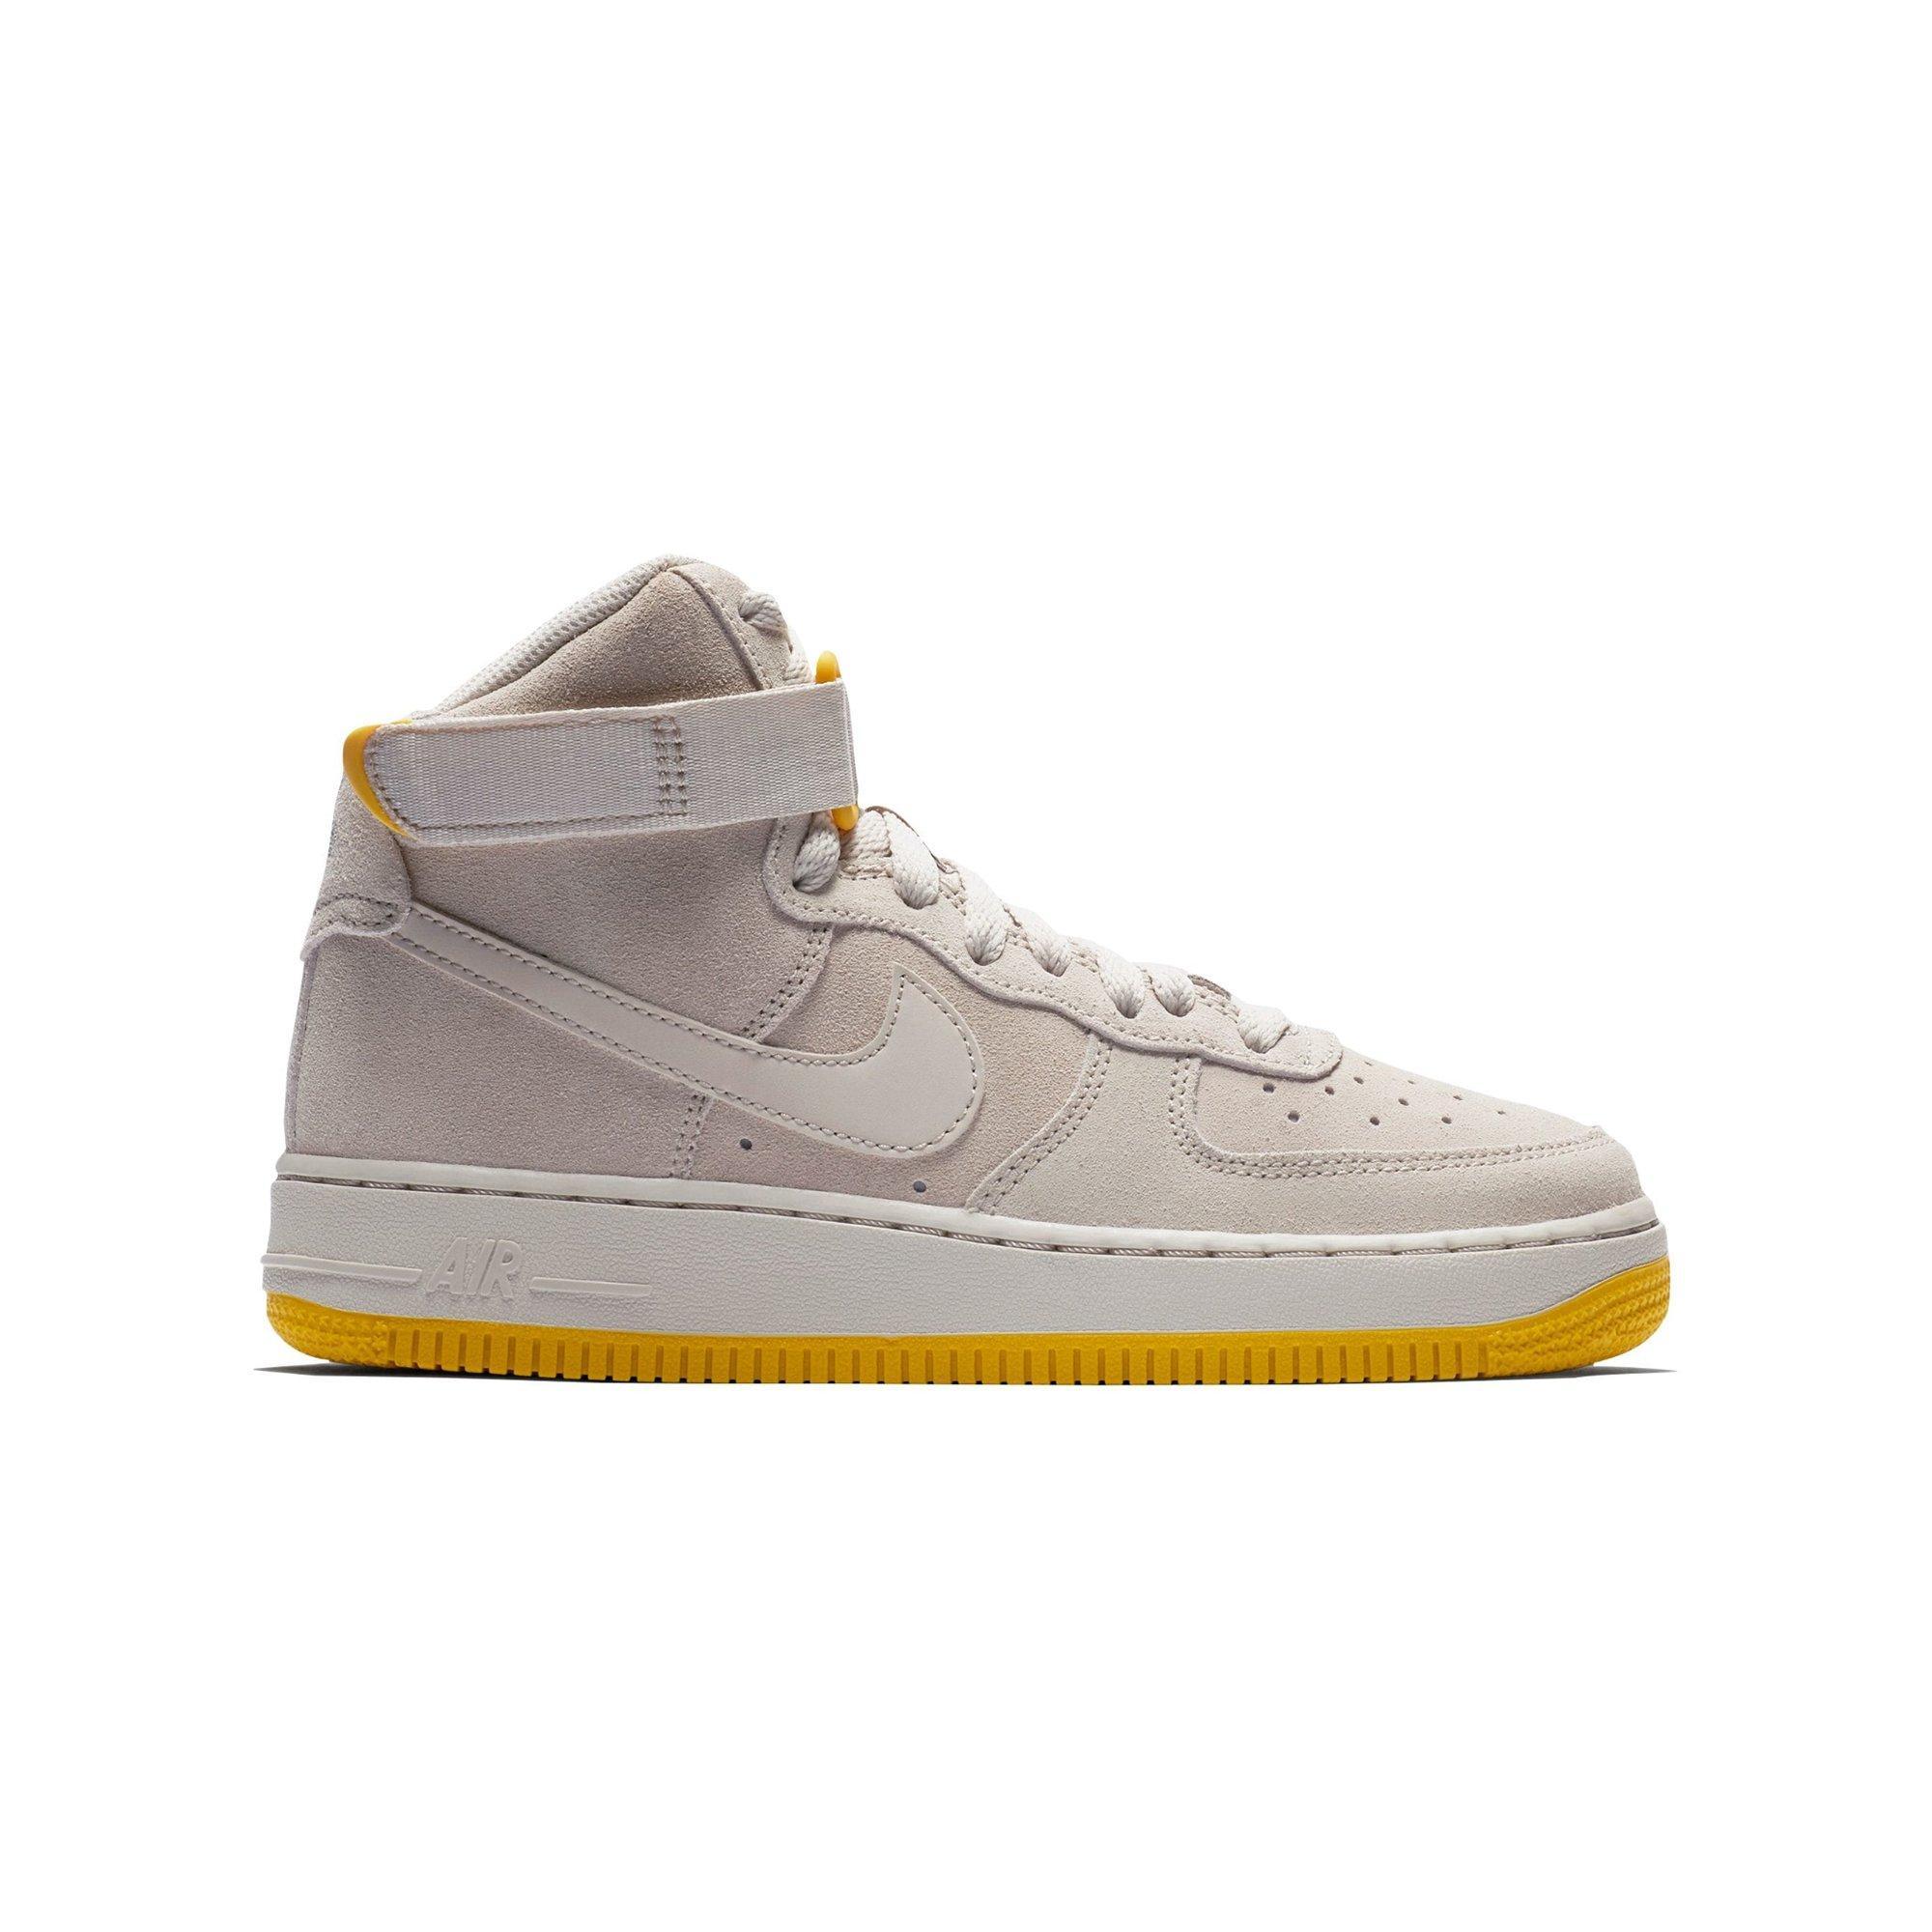 adidas nmd kids pink yeezy ultra boost grey